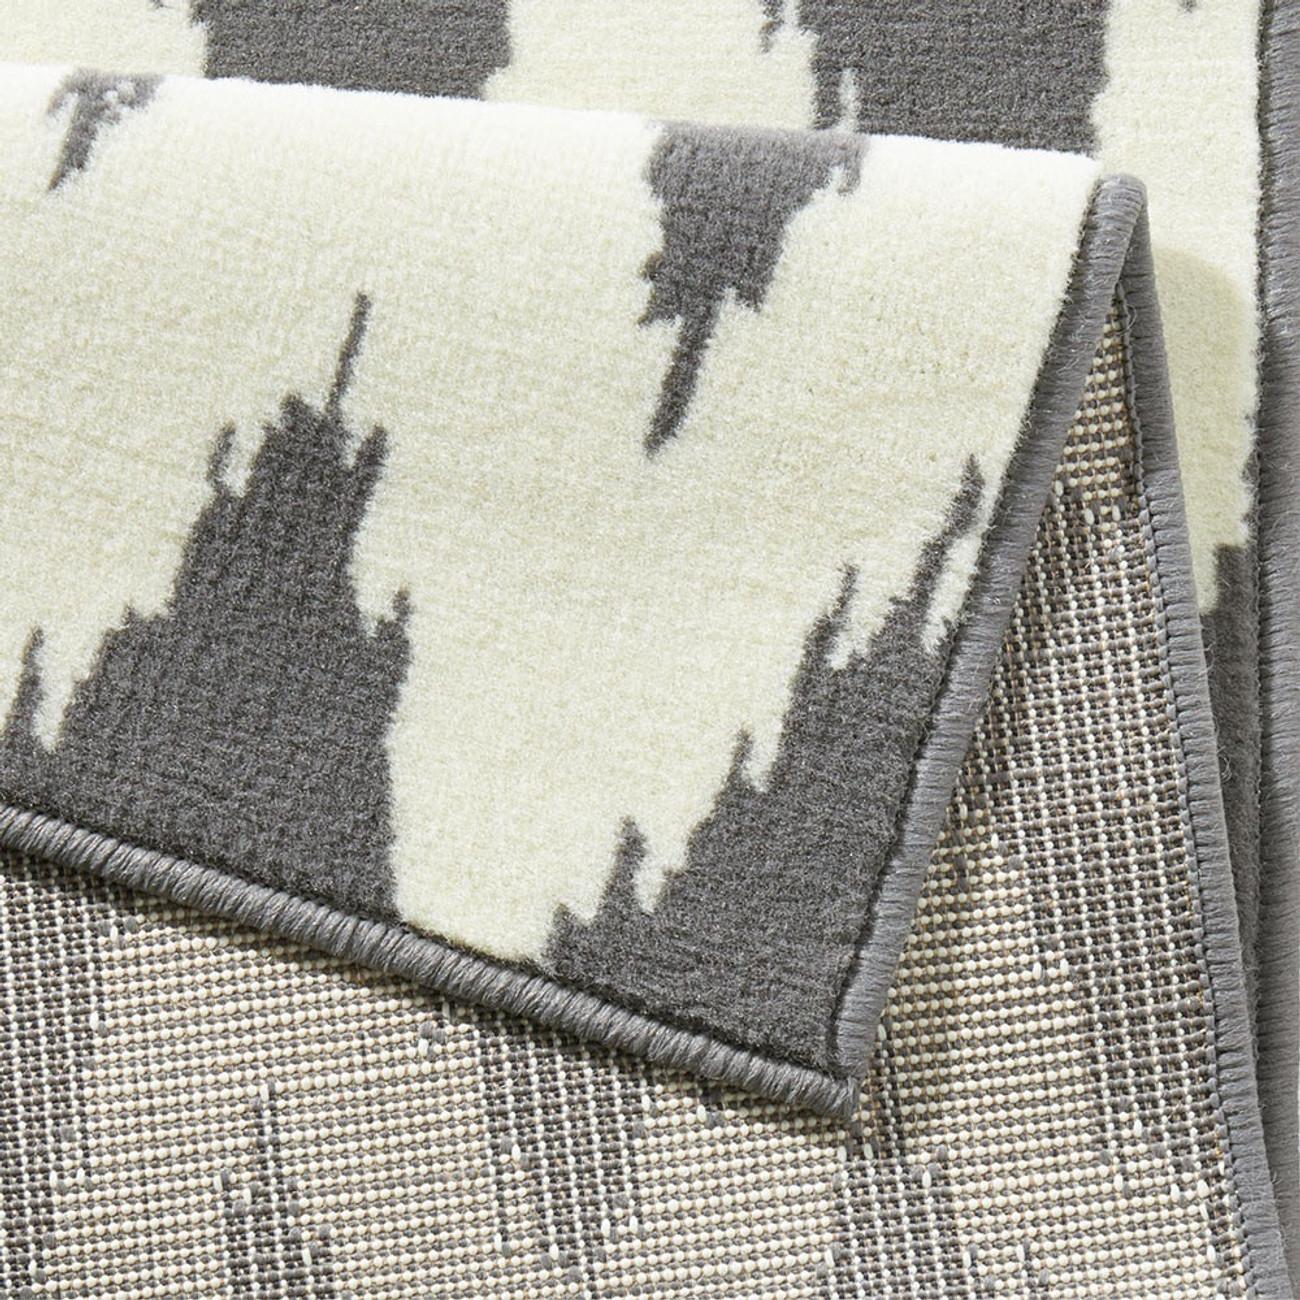 design velours teppichl ufer br cke fabric grau creme teppiche l ufer. Black Bedroom Furniture Sets. Home Design Ideas